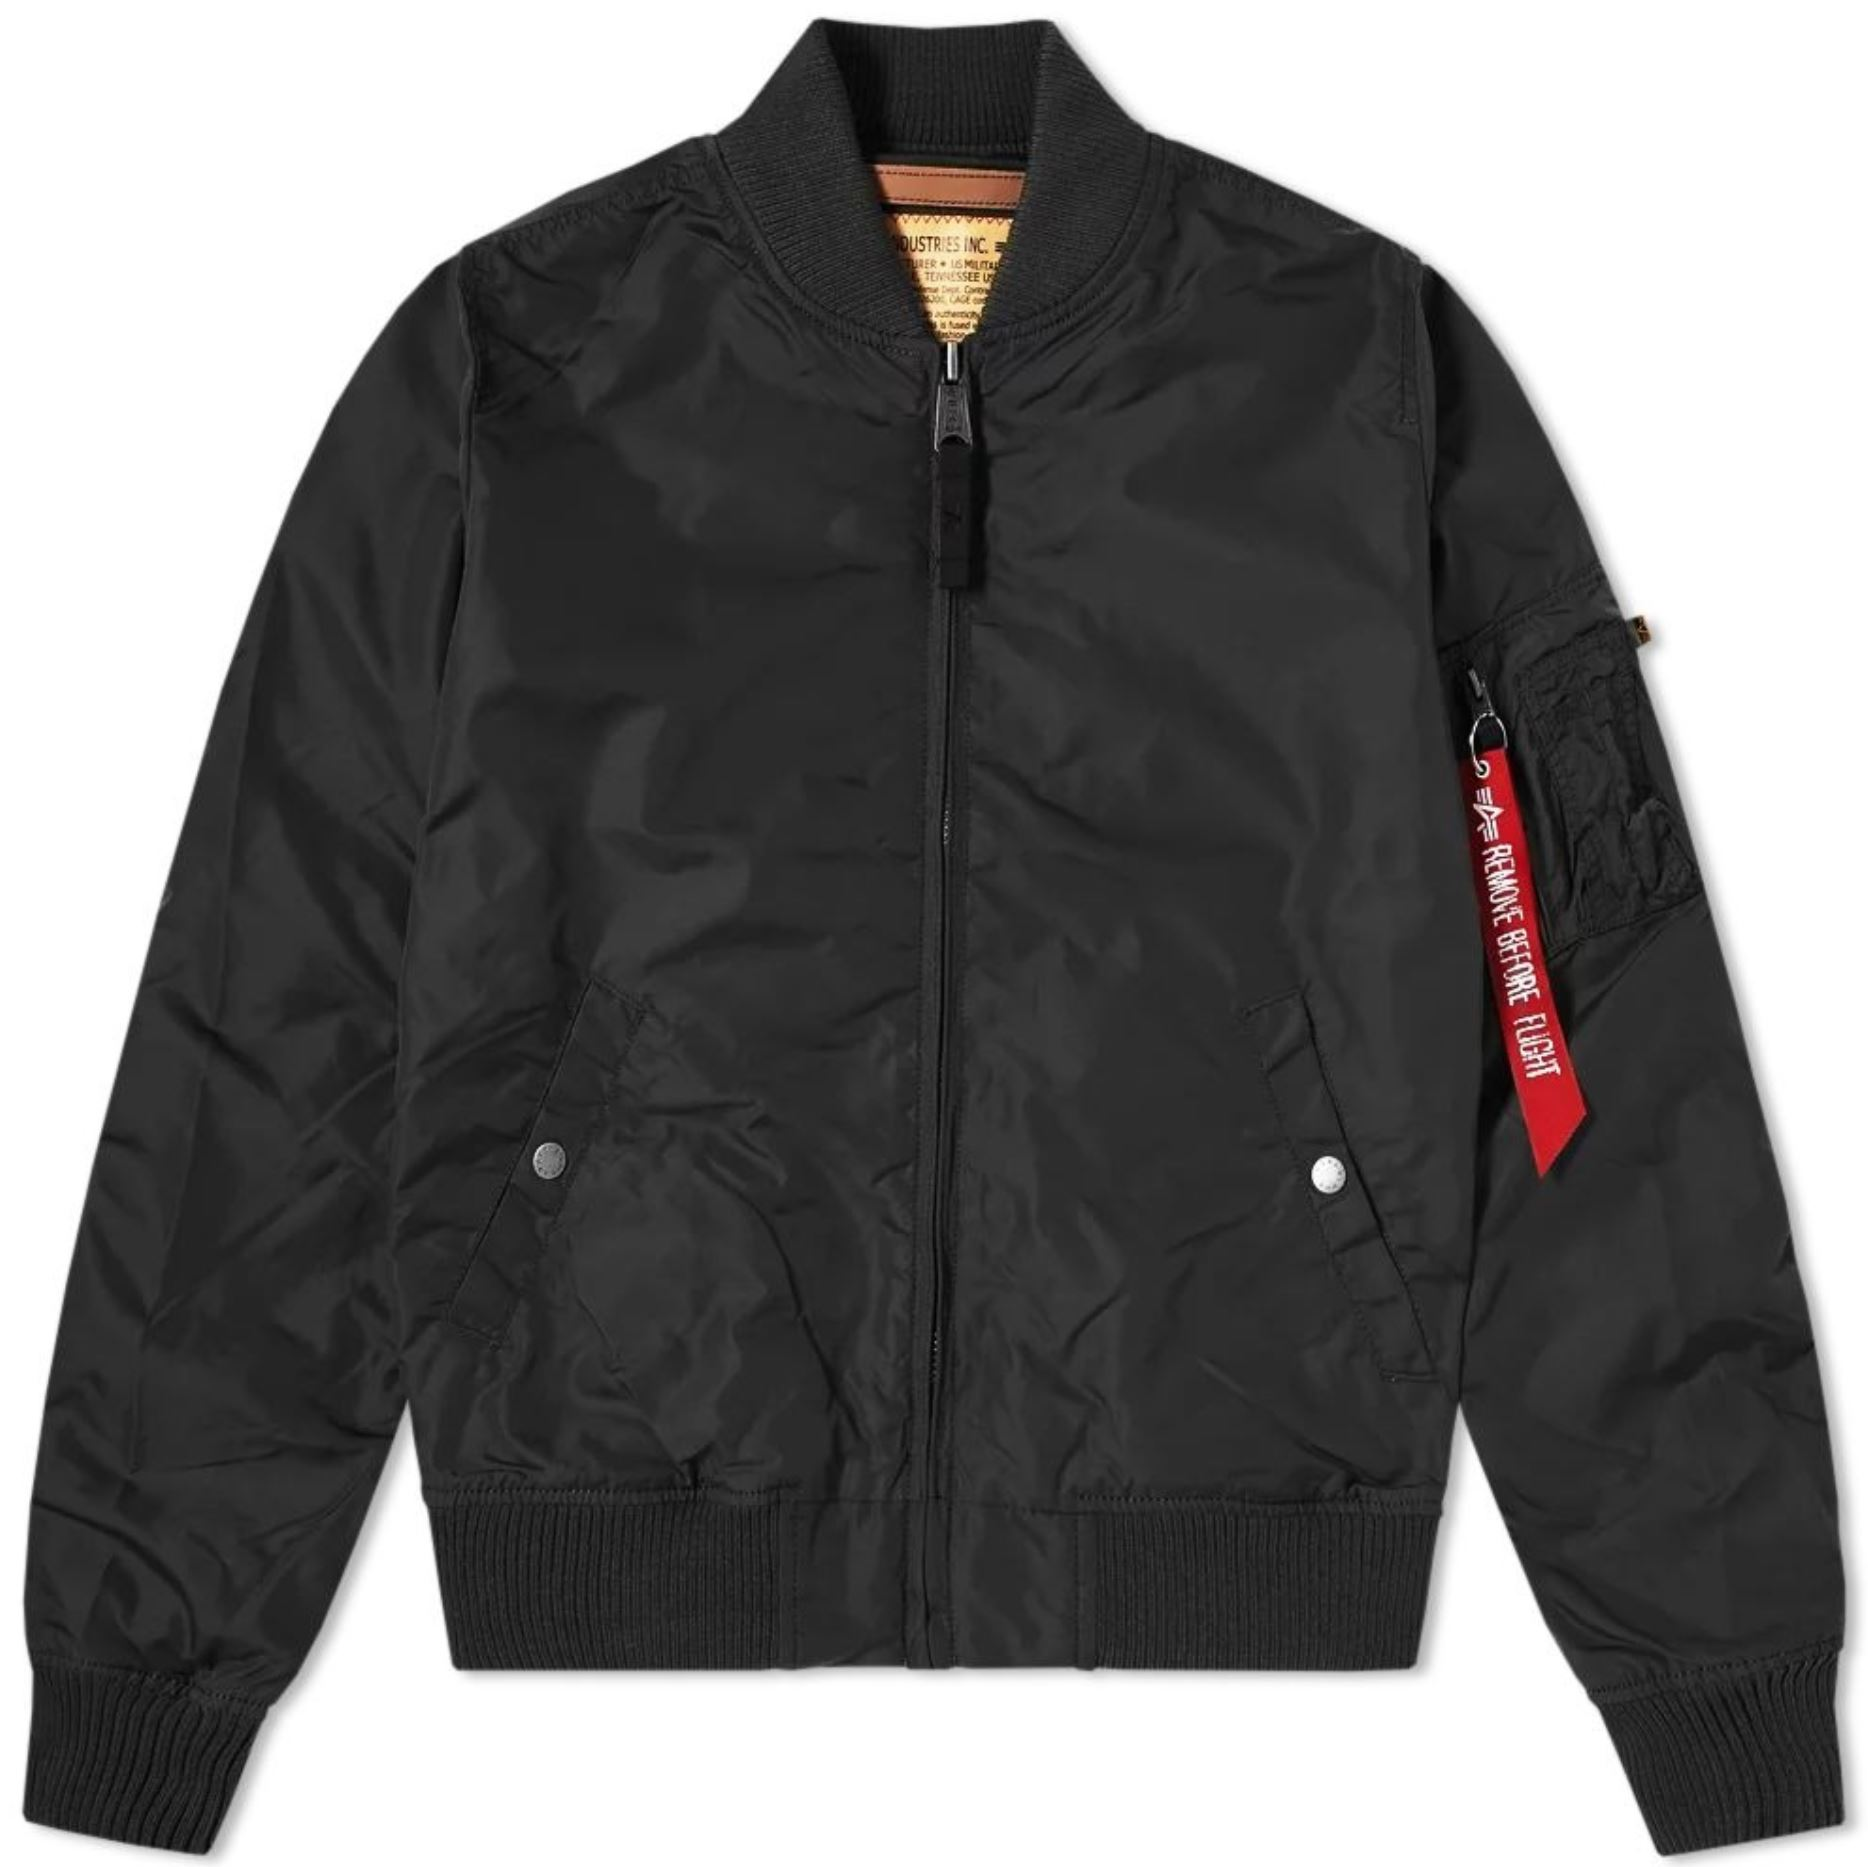 Black Bomber Jacket from endclothing.com